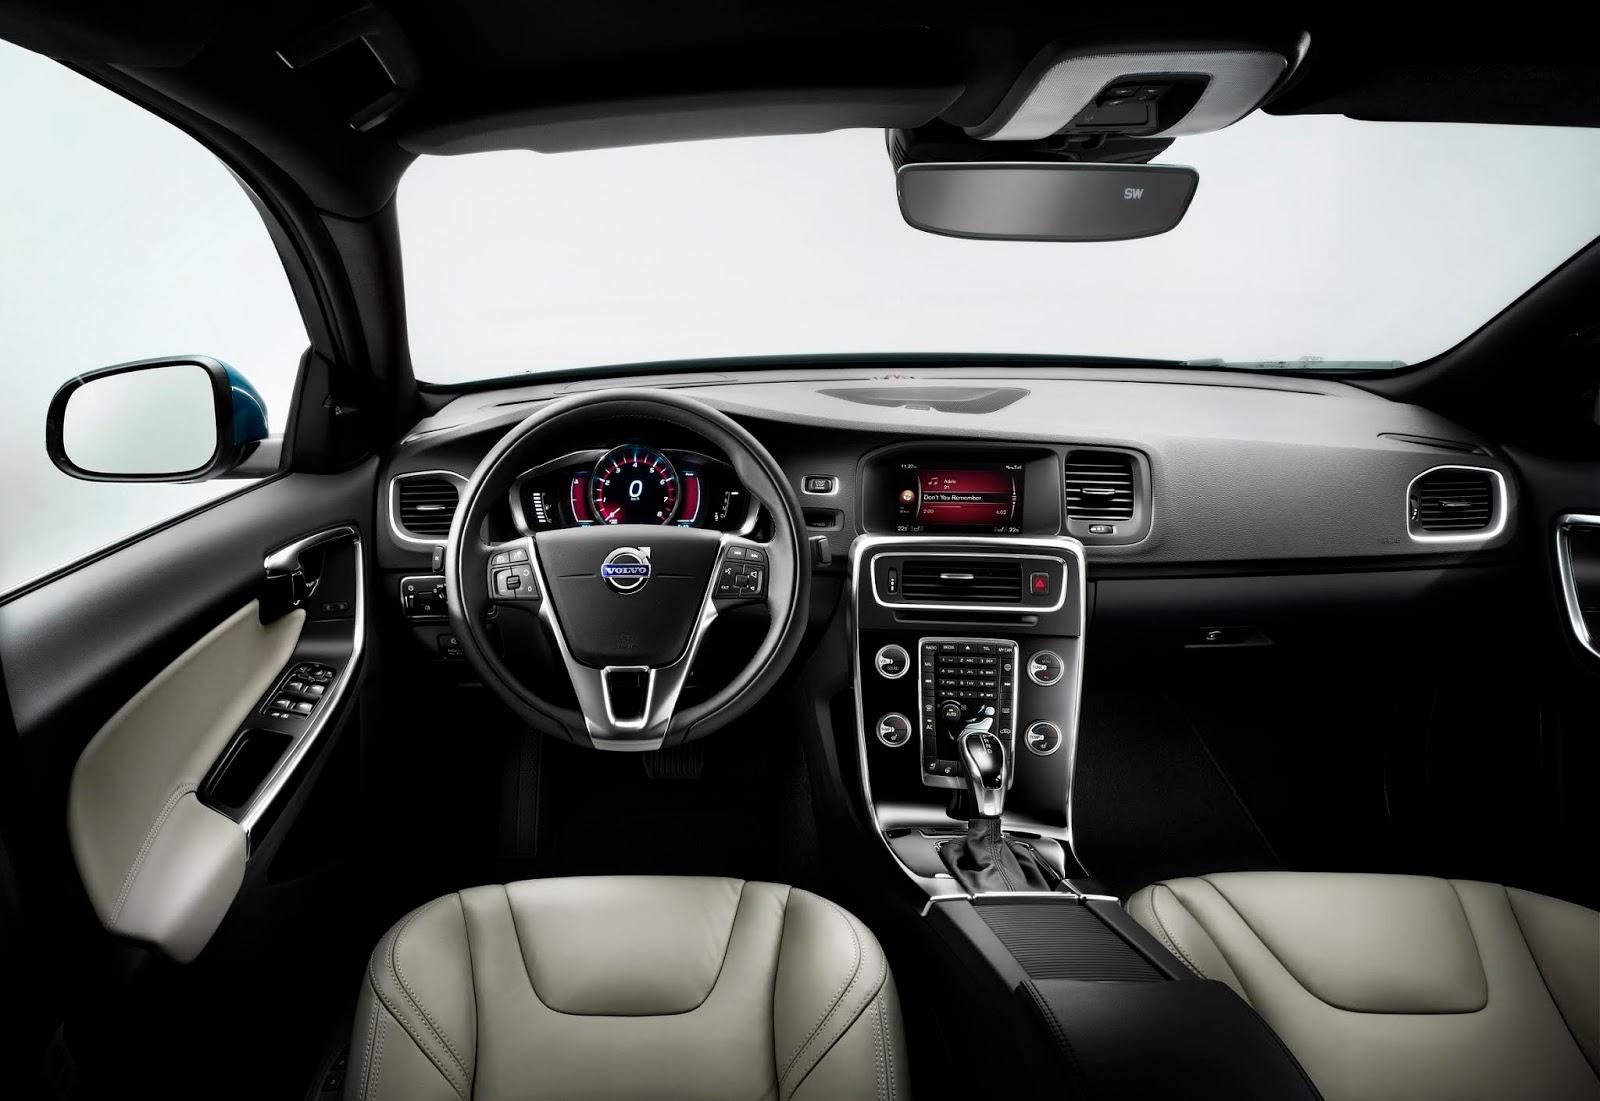 VCC08014 Προσφορά ως τις 30 Ιουνίου για τα Volvo S60 και V60 Volvo, Volvo S60, Volvo V60